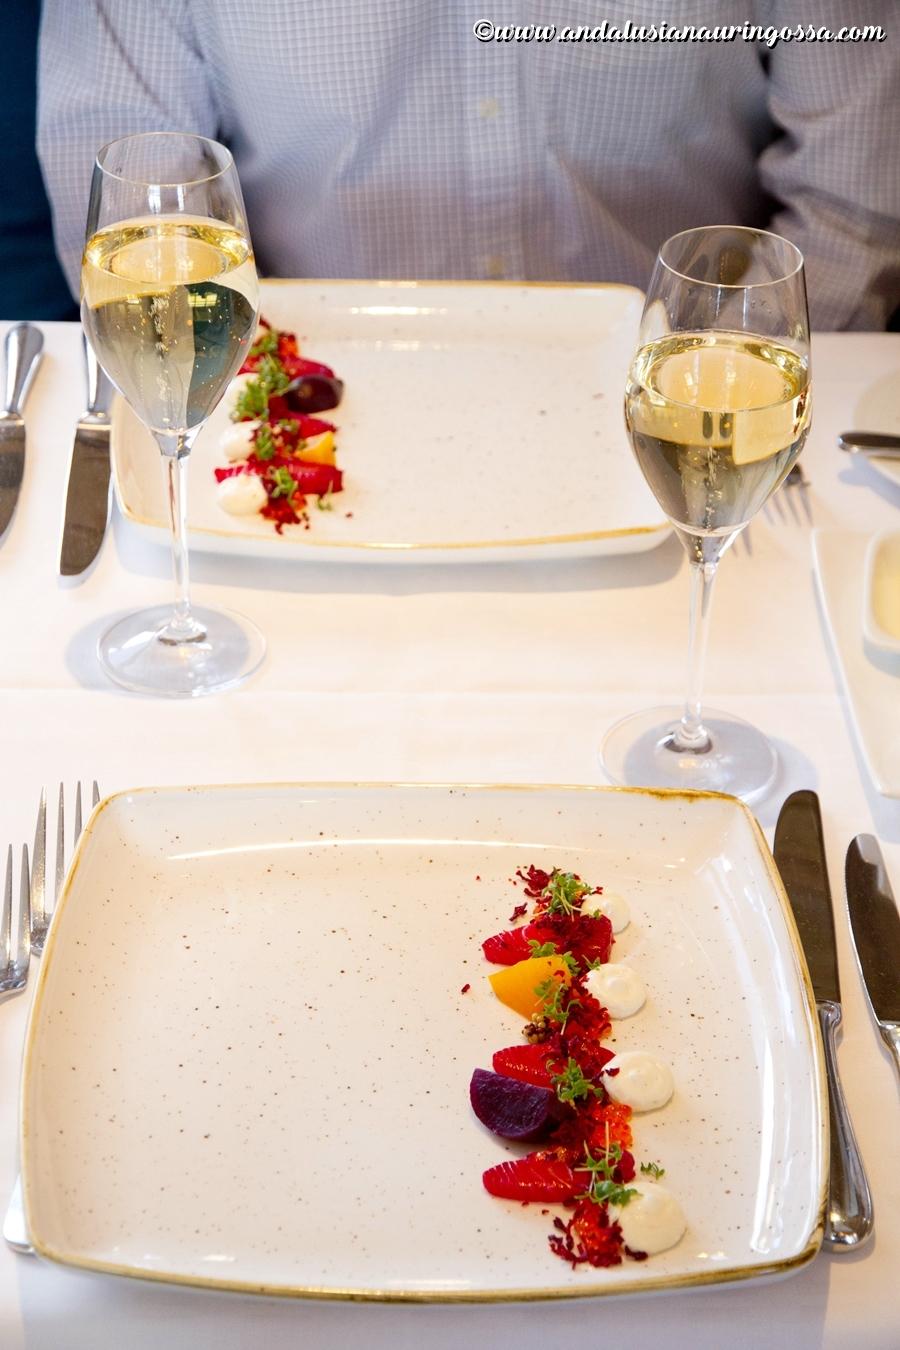 Sjomagasinet_Goteborg_Michelin ravintola_ravintolasuositus_Andalusian Auringossa_ruokablogi_matkablogi_7